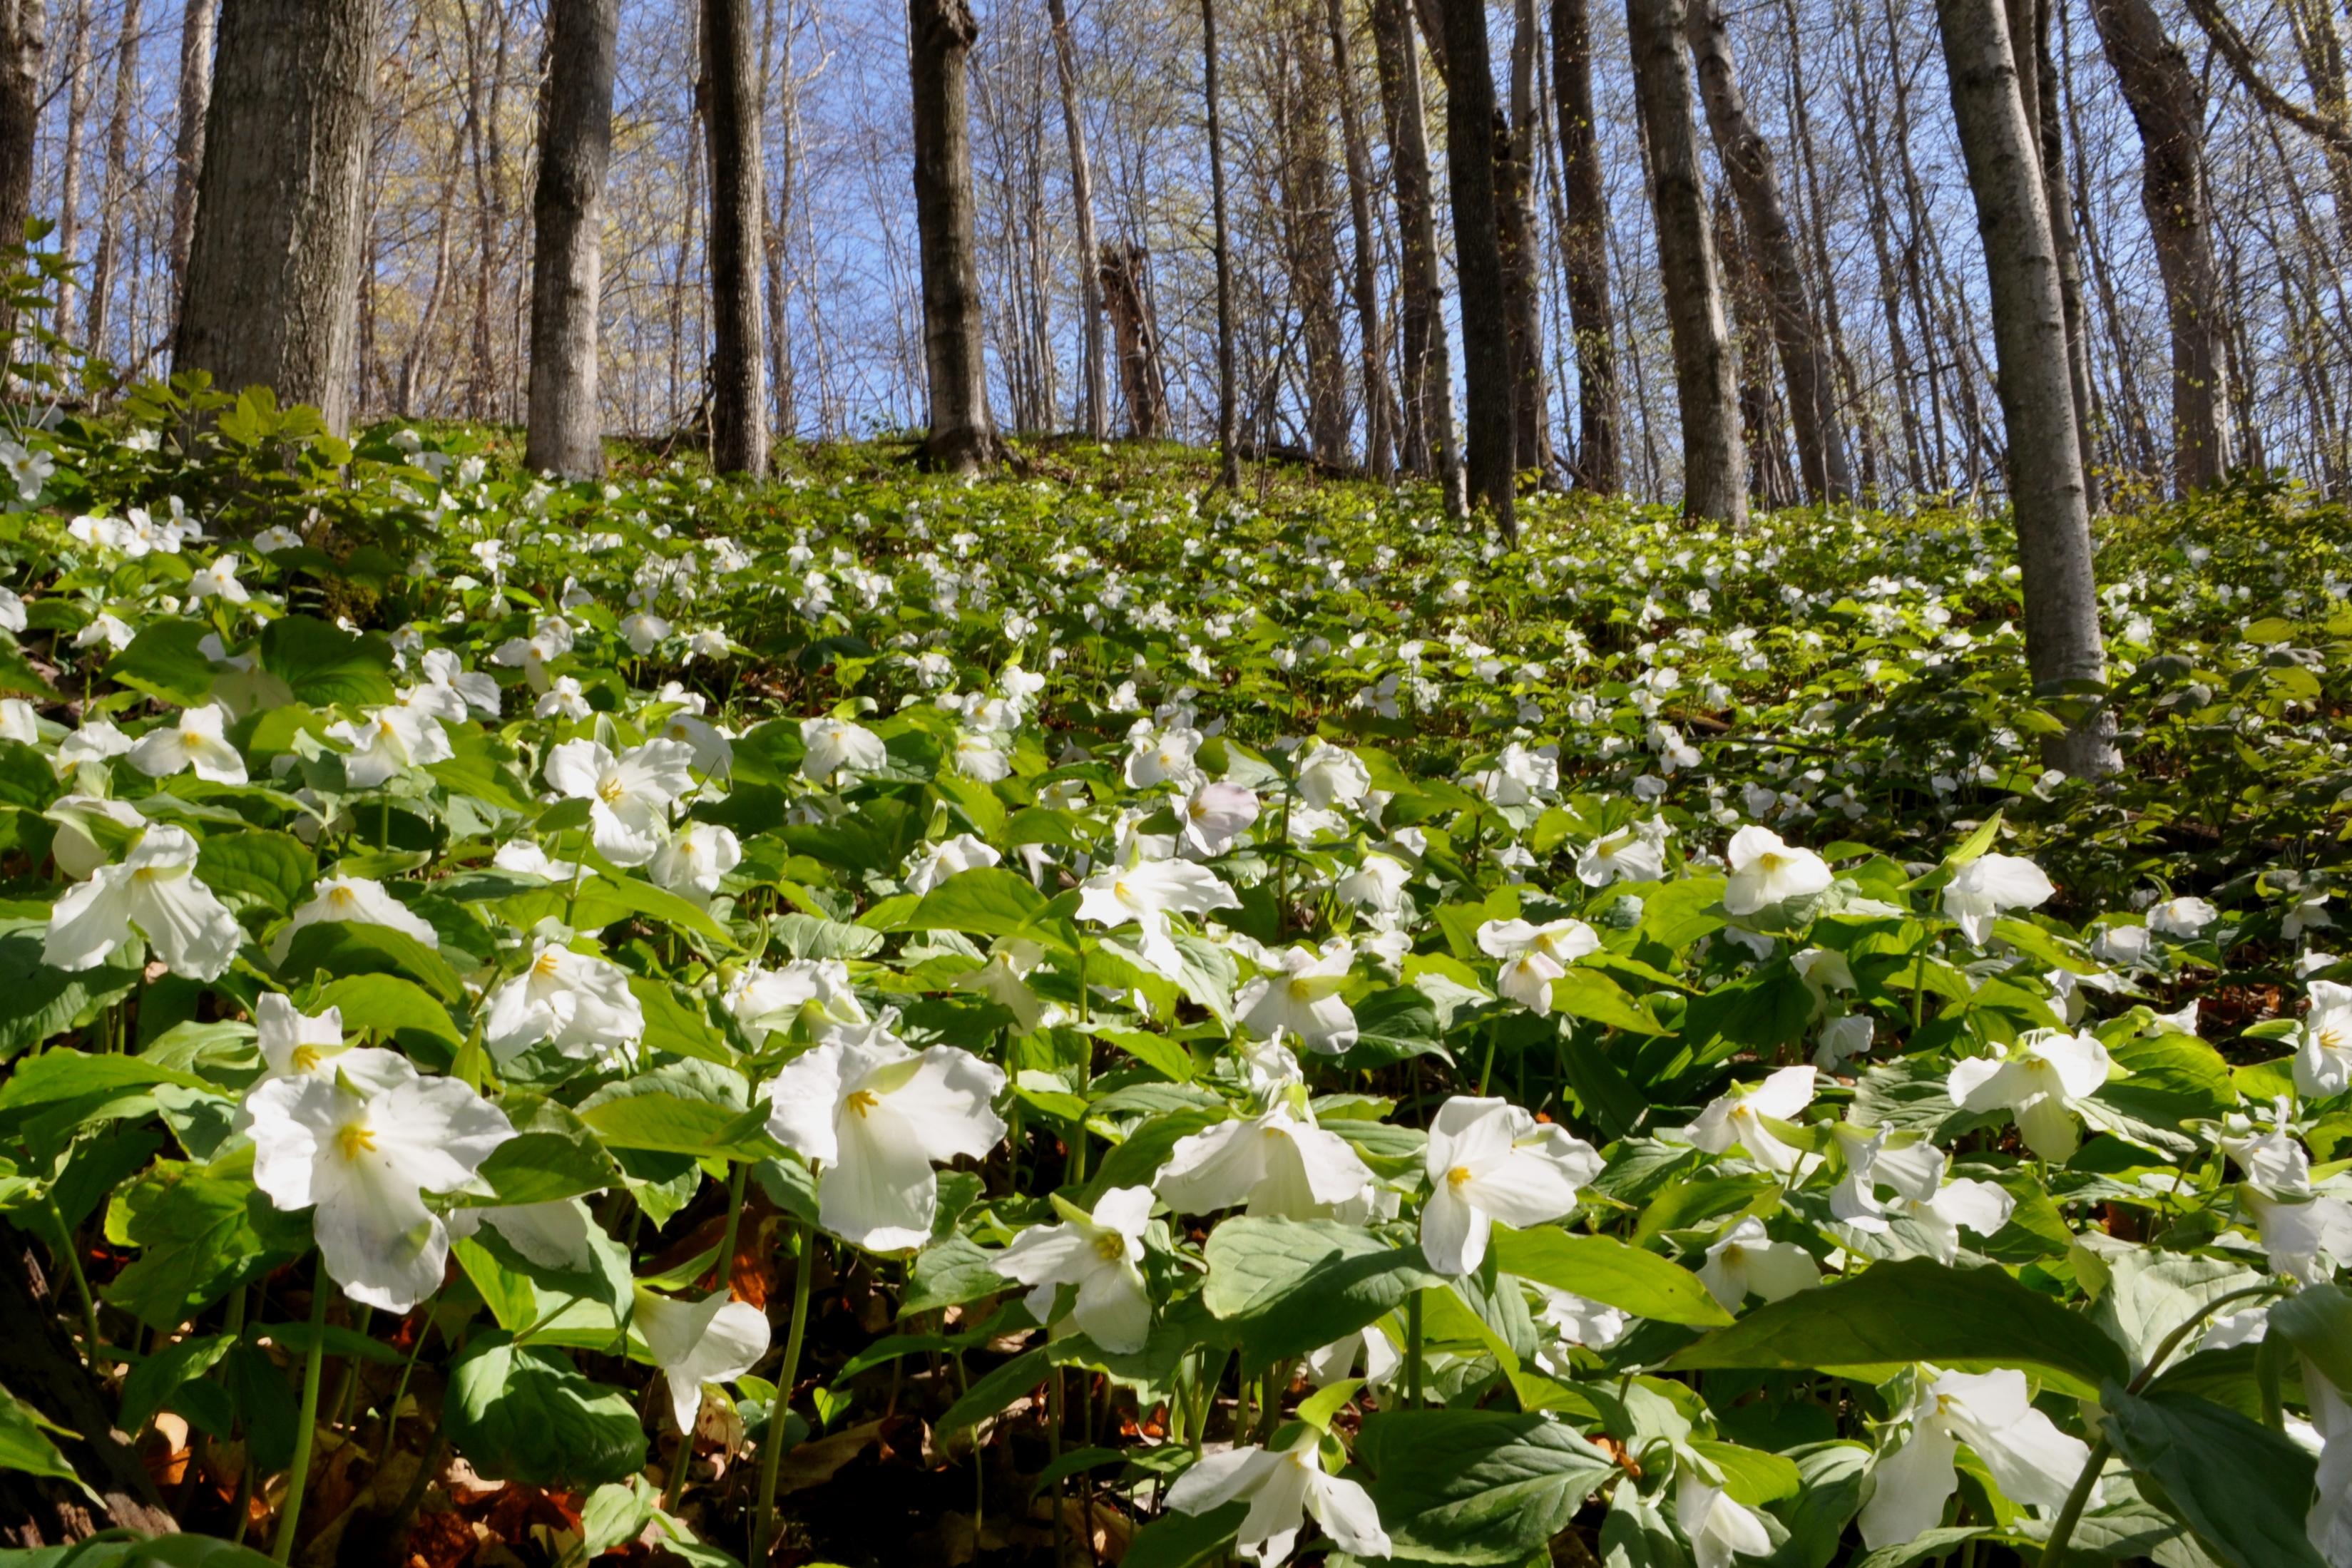 White Trillium Nicks Nature Pics